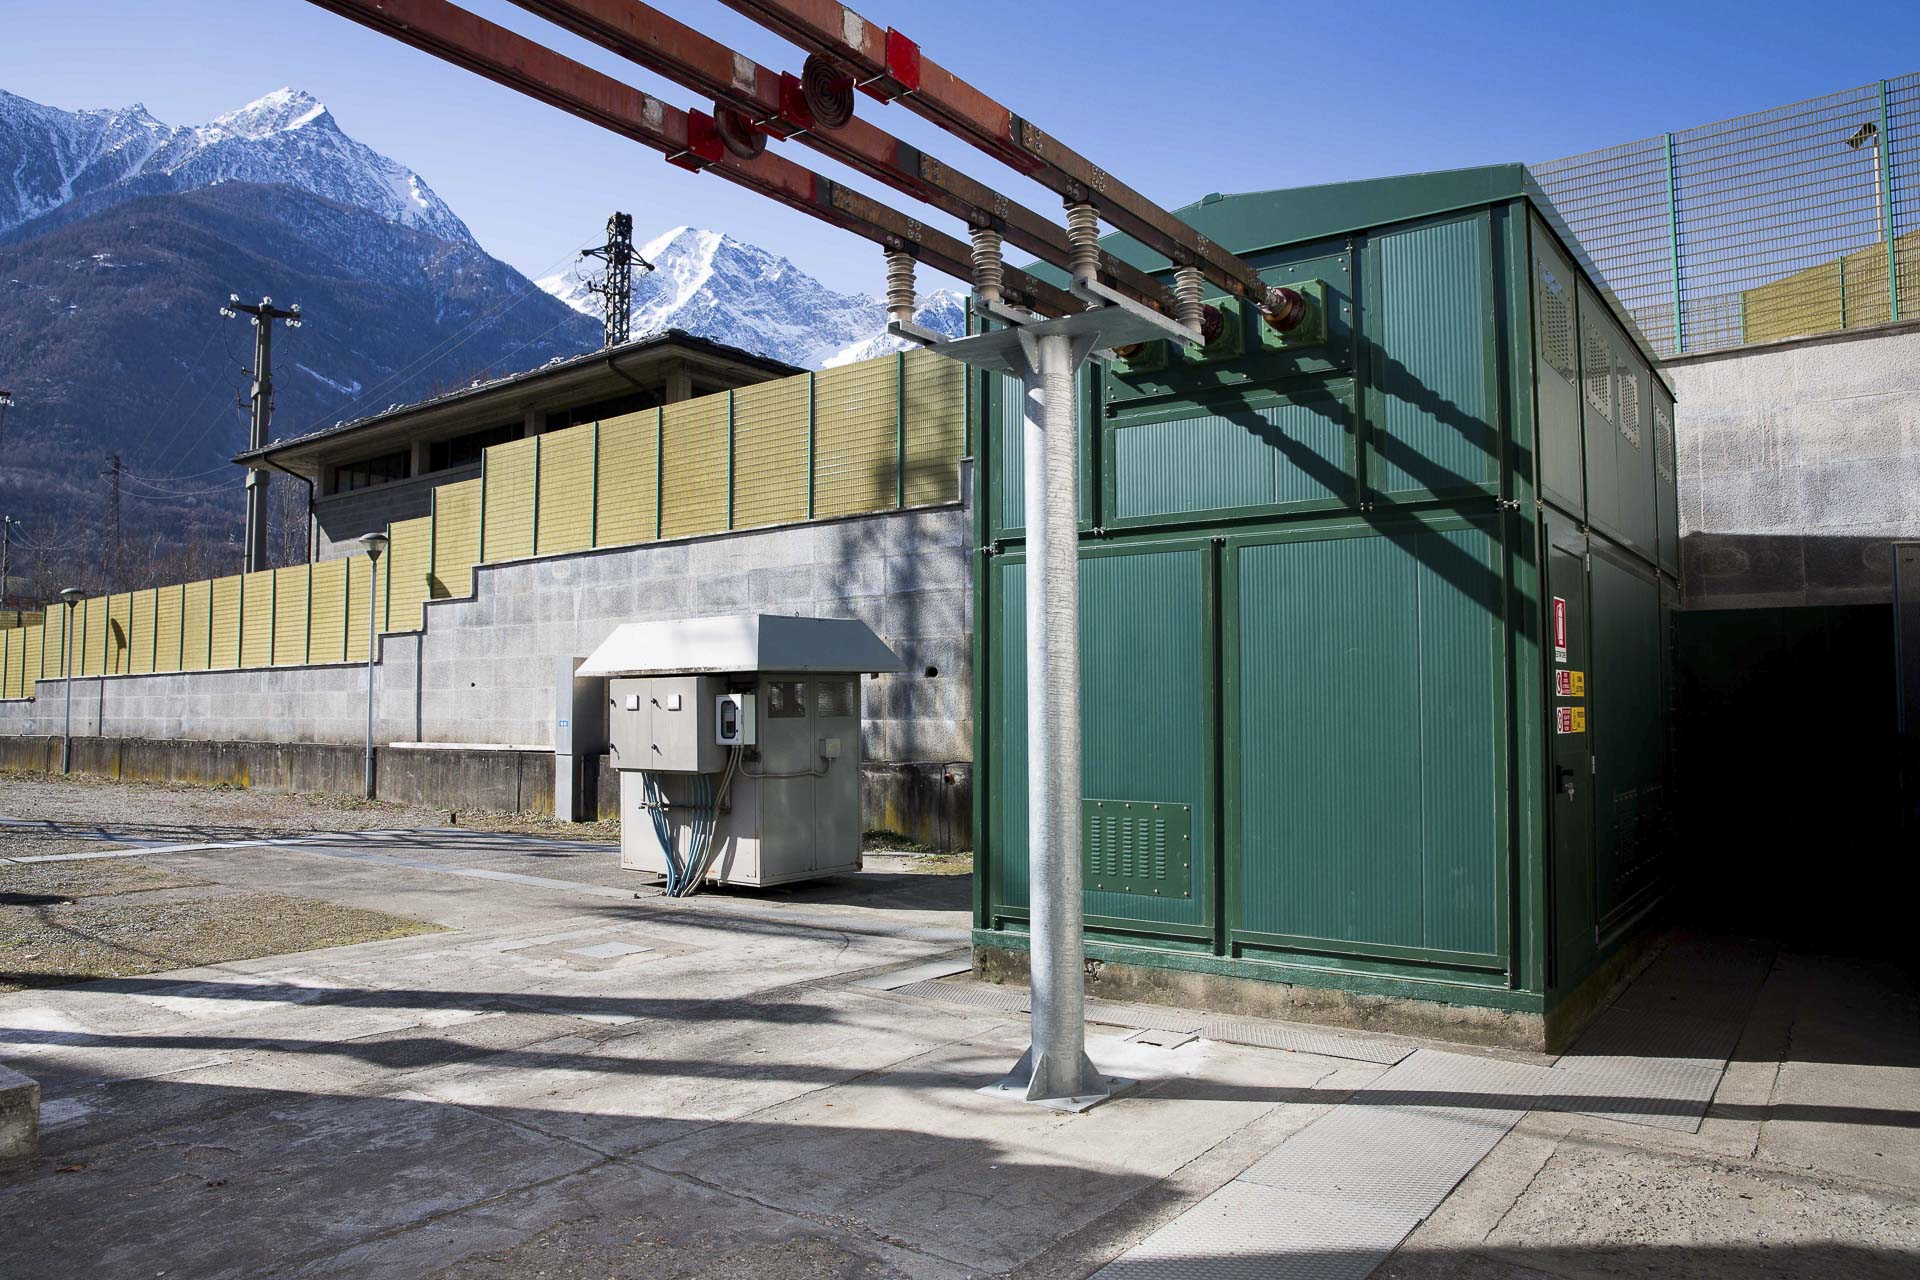 Centrale produzione energia idroelettrica verde di Quart